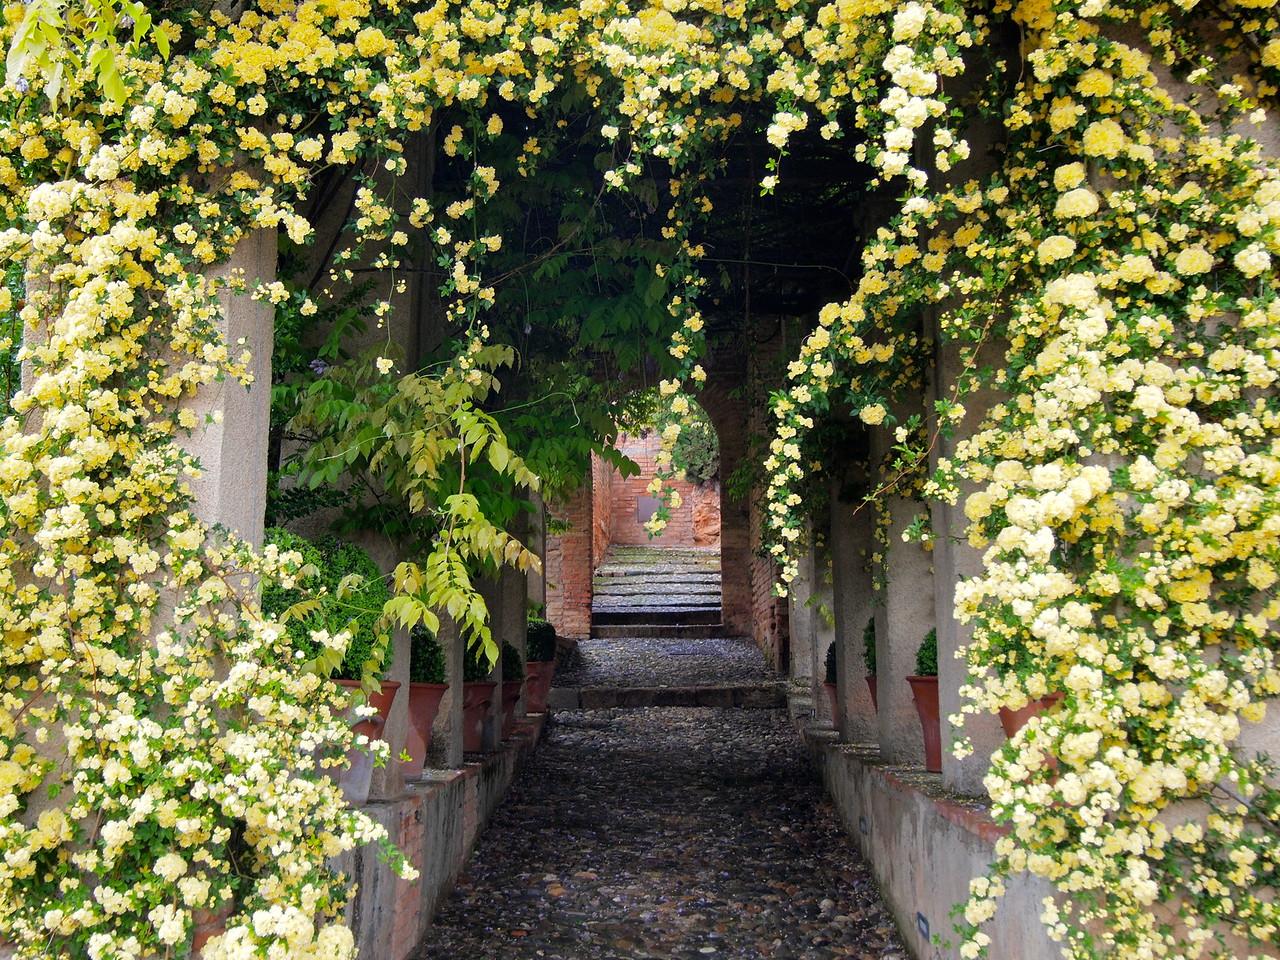 Generalife Gardens at the Alhambra in Granada, Spain